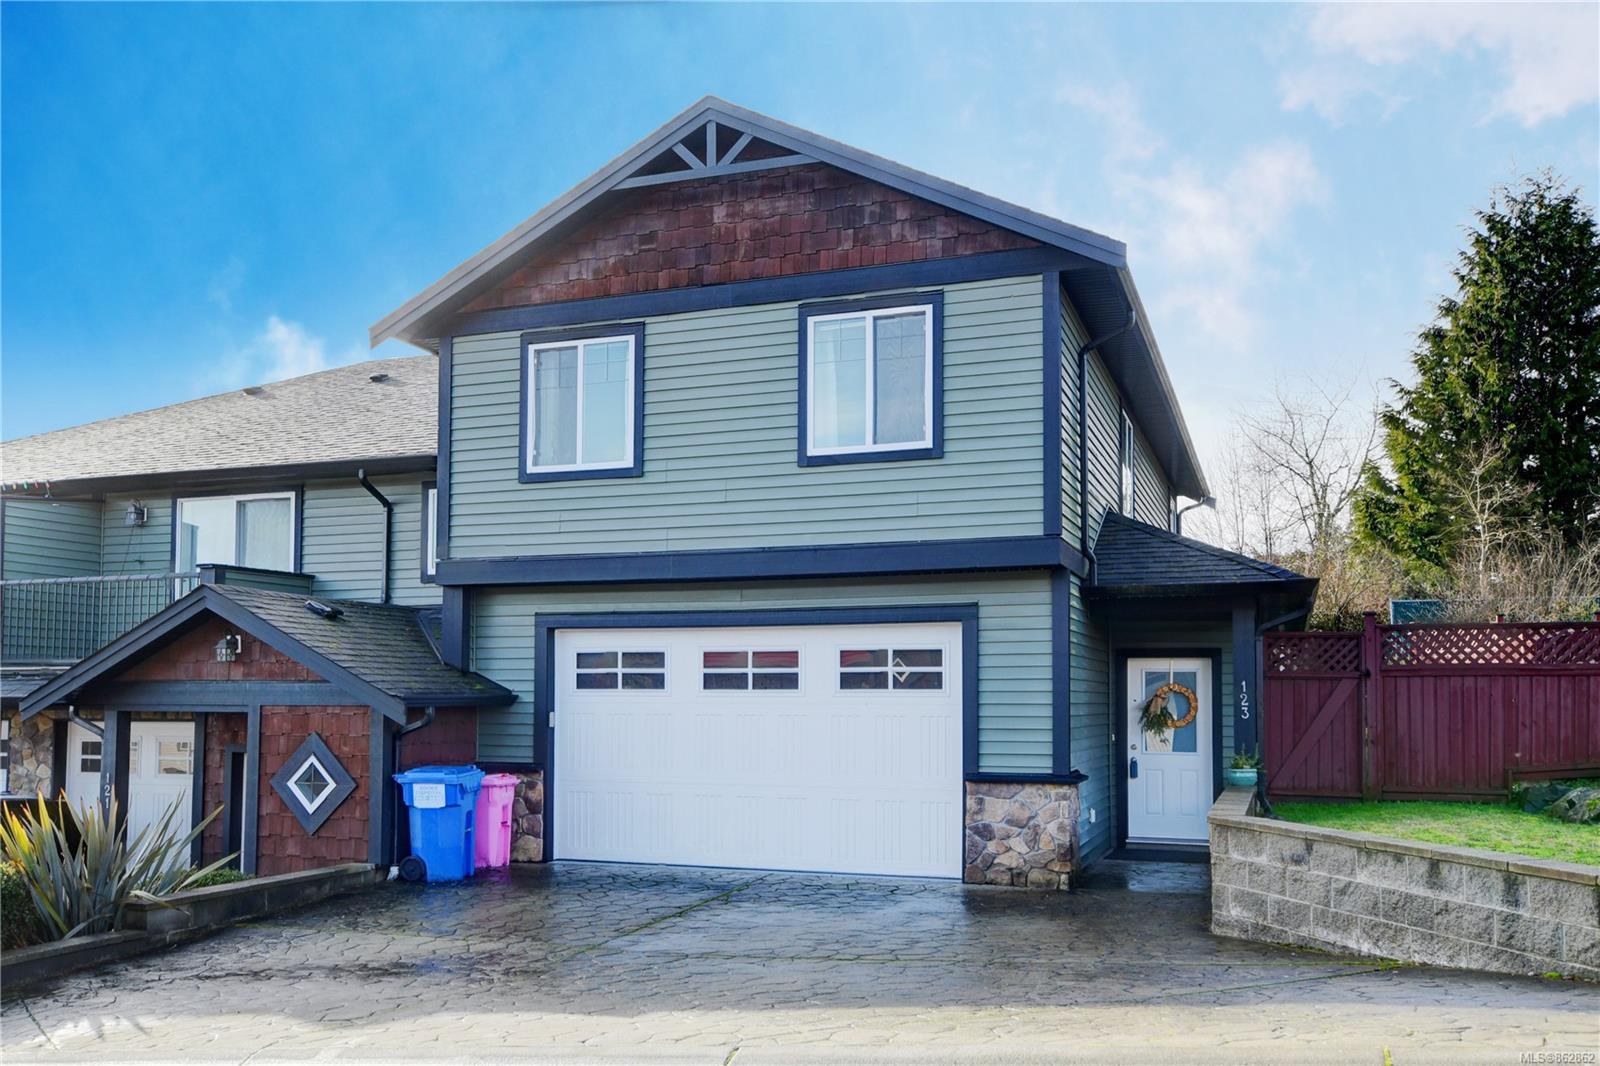 Main Photo: 123 6838 W Grant Rd in : Sk John Muir Row/Townhouse for sale (Sooke)  : MLS®# 862862